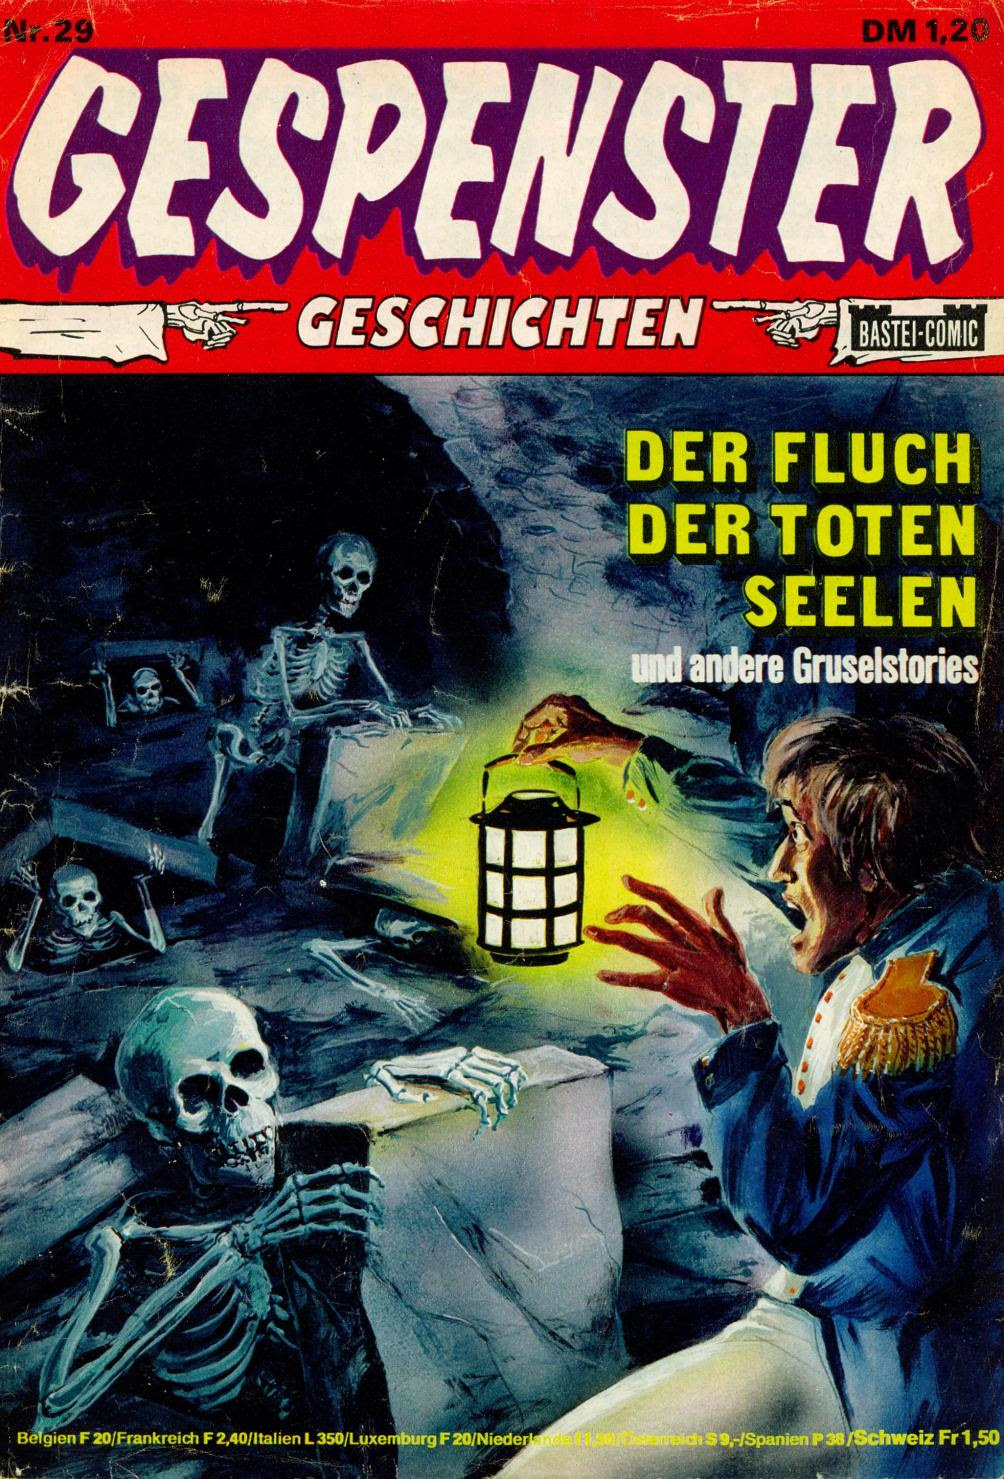 Gespenster Geschichten - 29